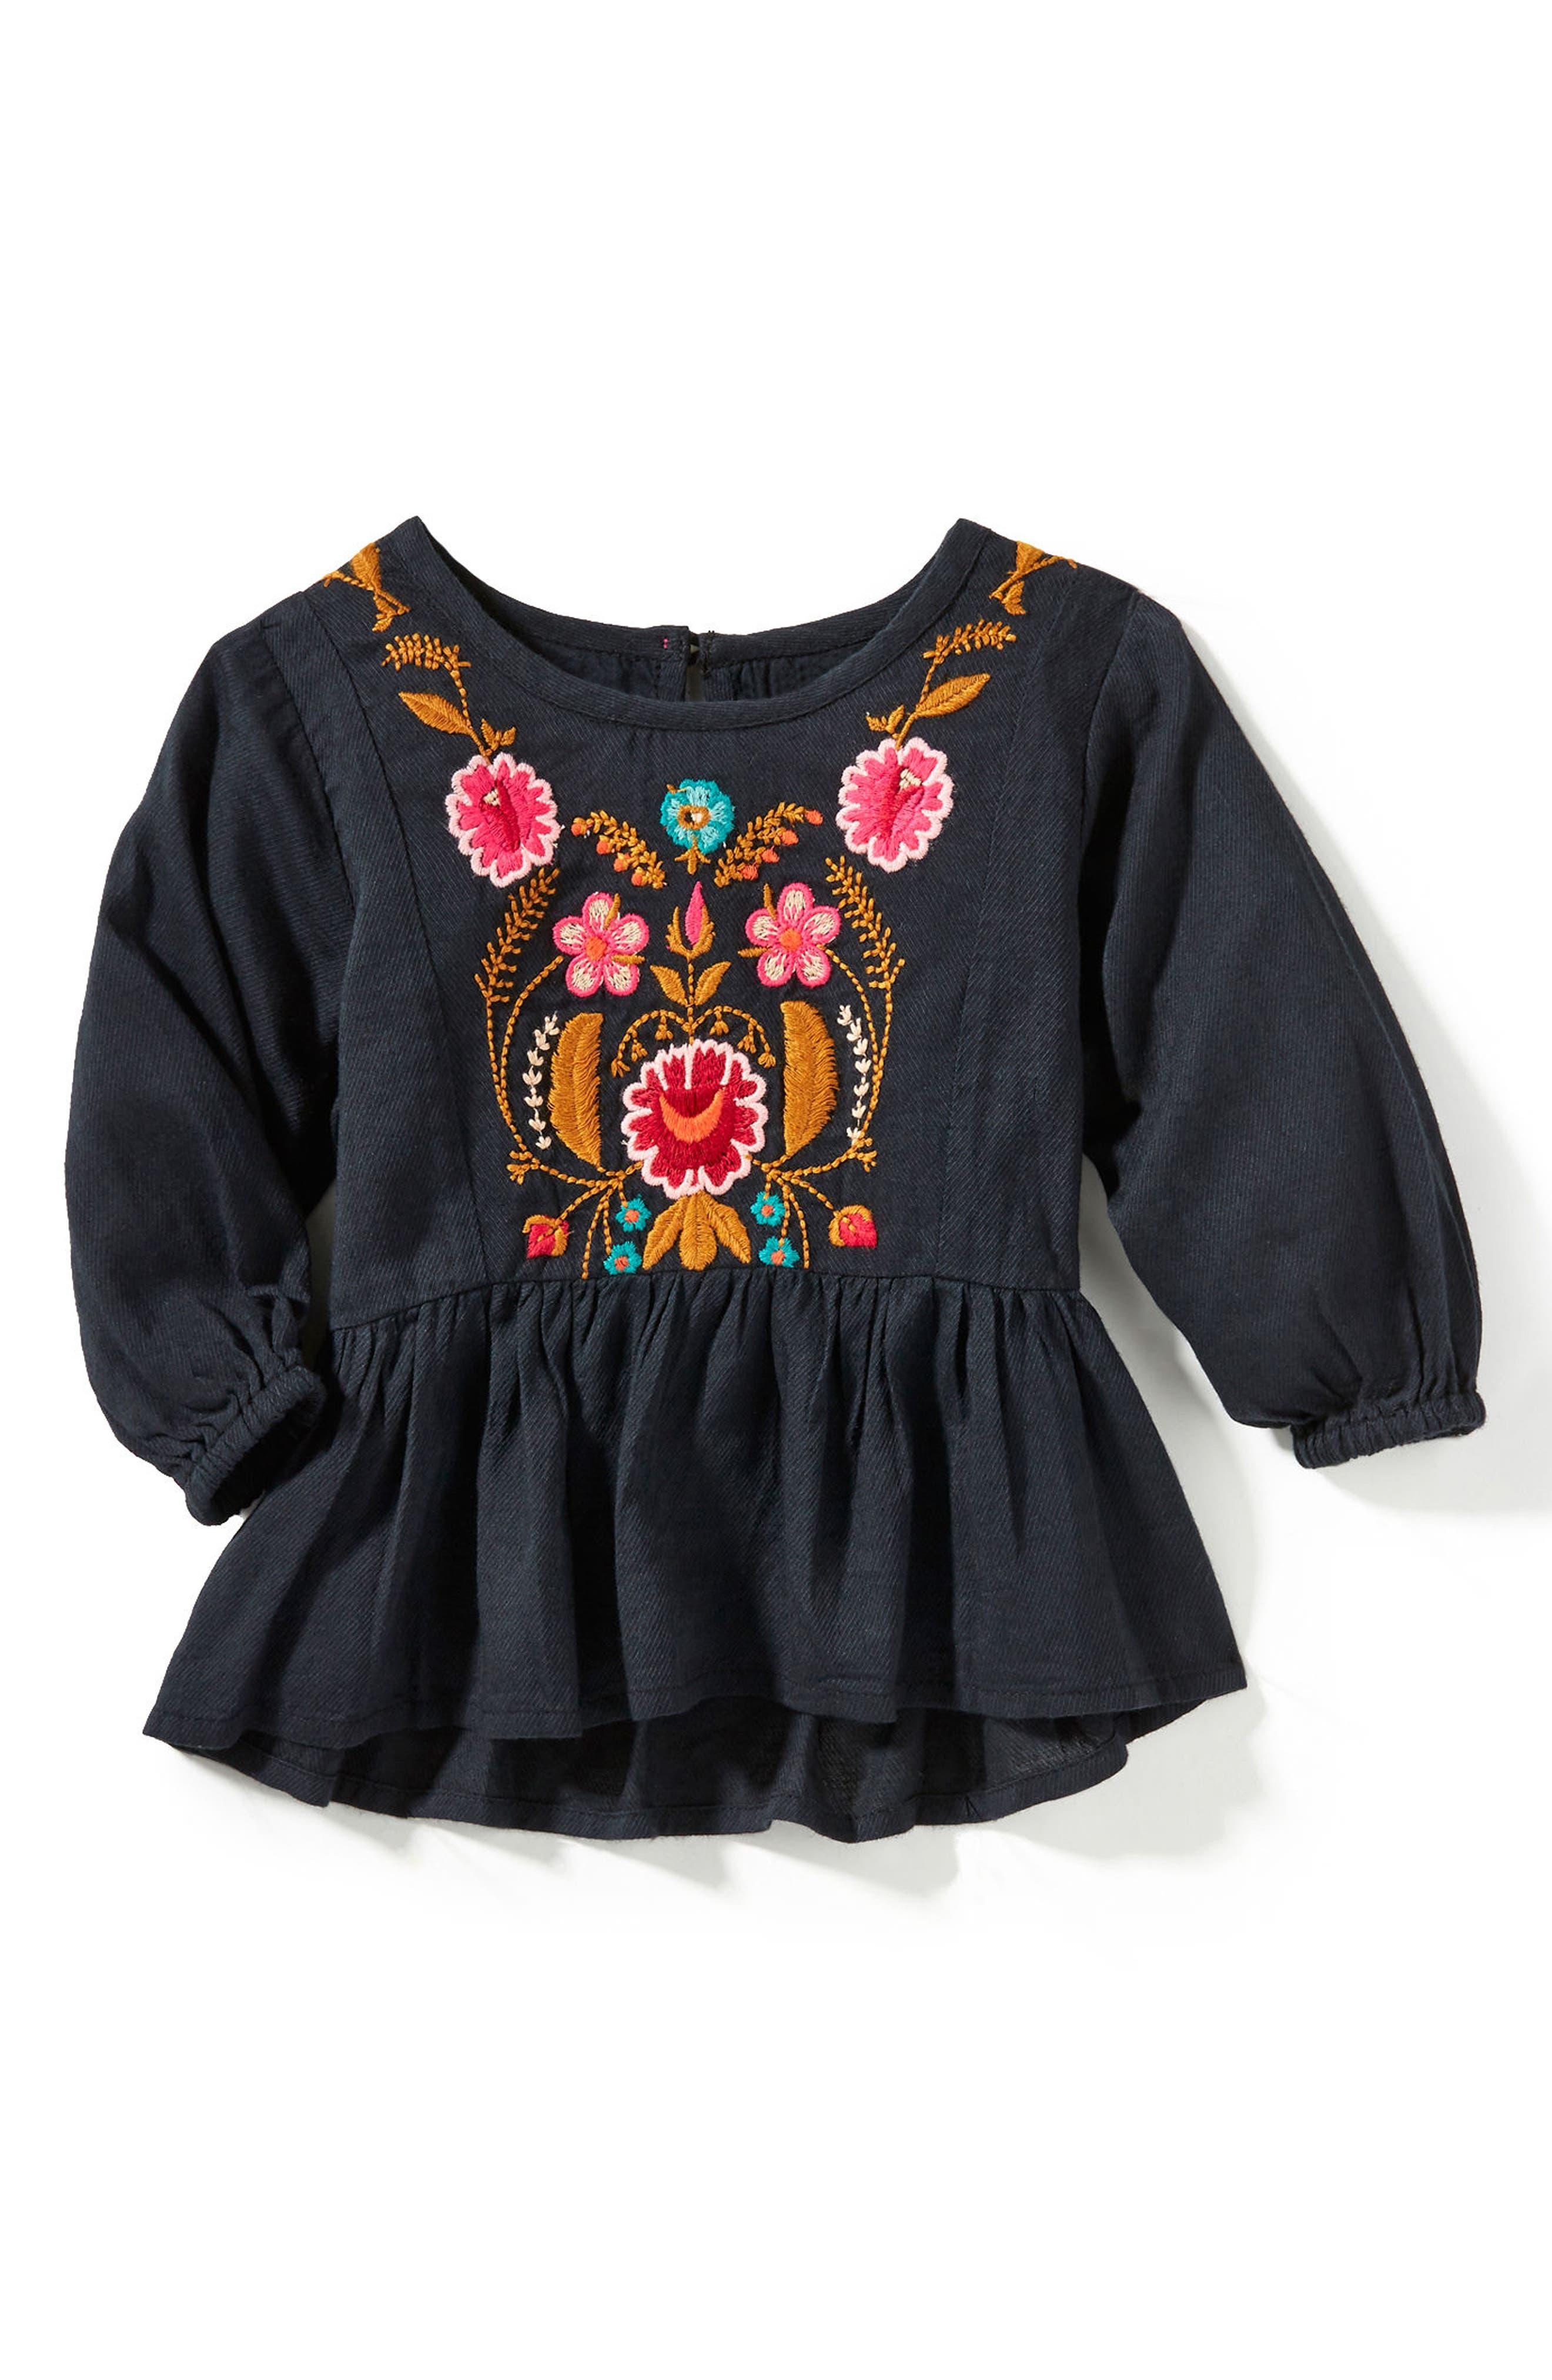 Alternate Image 1 Selected - Peek Emma Embroidered Twill Tunic (Baby Girls)